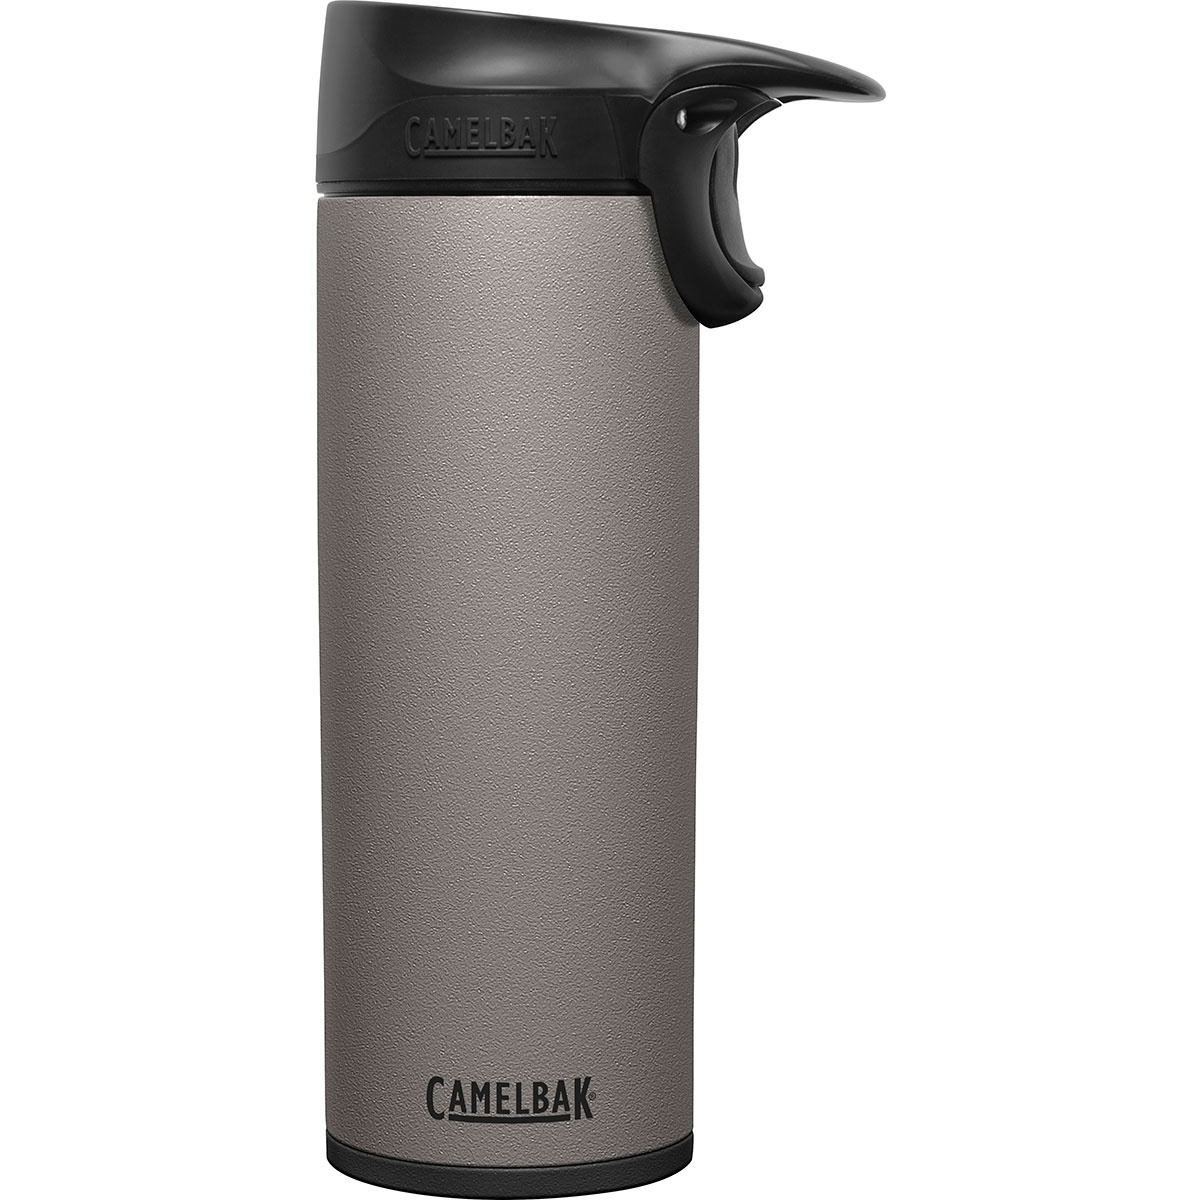 Camelbak Drinkfles Forge self seal 0.5L